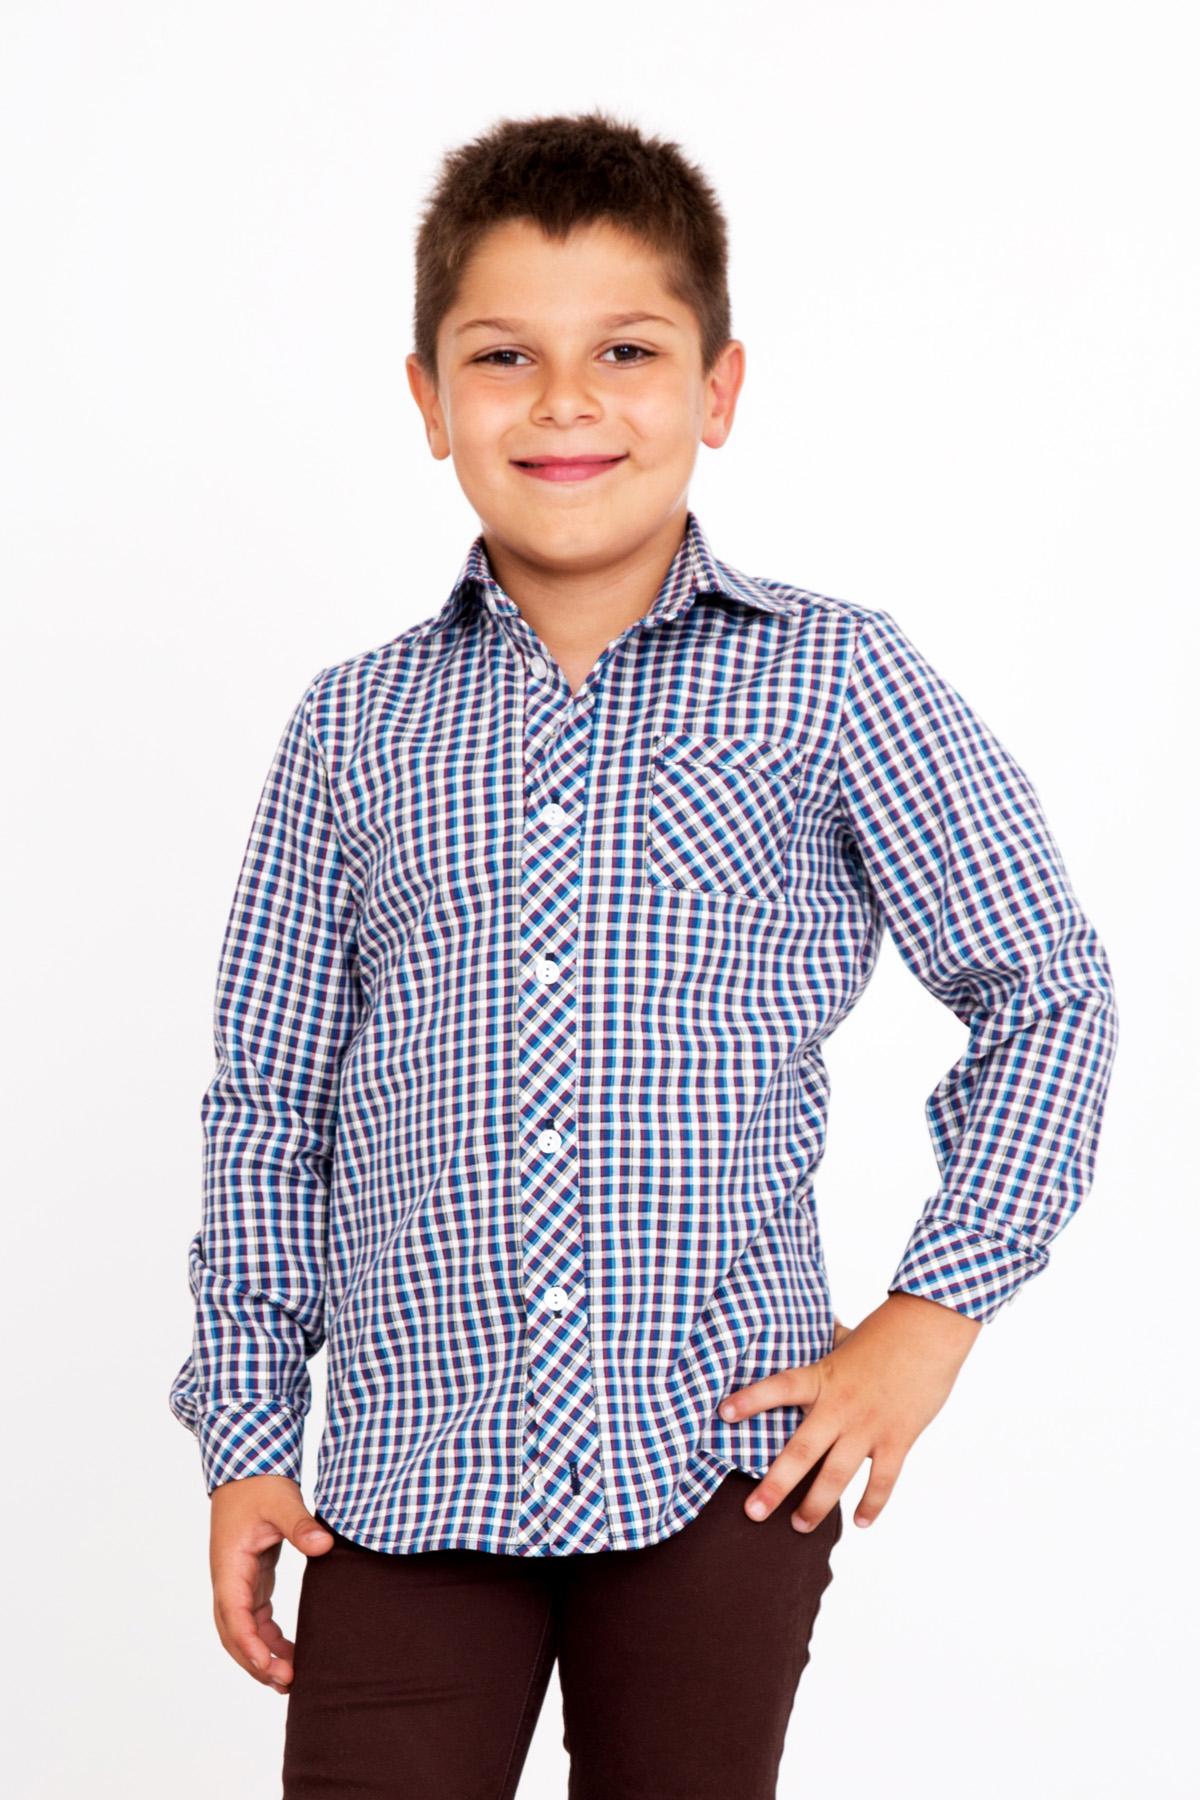 Дет. рубашка Августин р. 34Толстовки, джемпера и рубашки<br><br><br>Тип: Дет. рубашка<br>Размер: 34<br>Материал: Шотландка